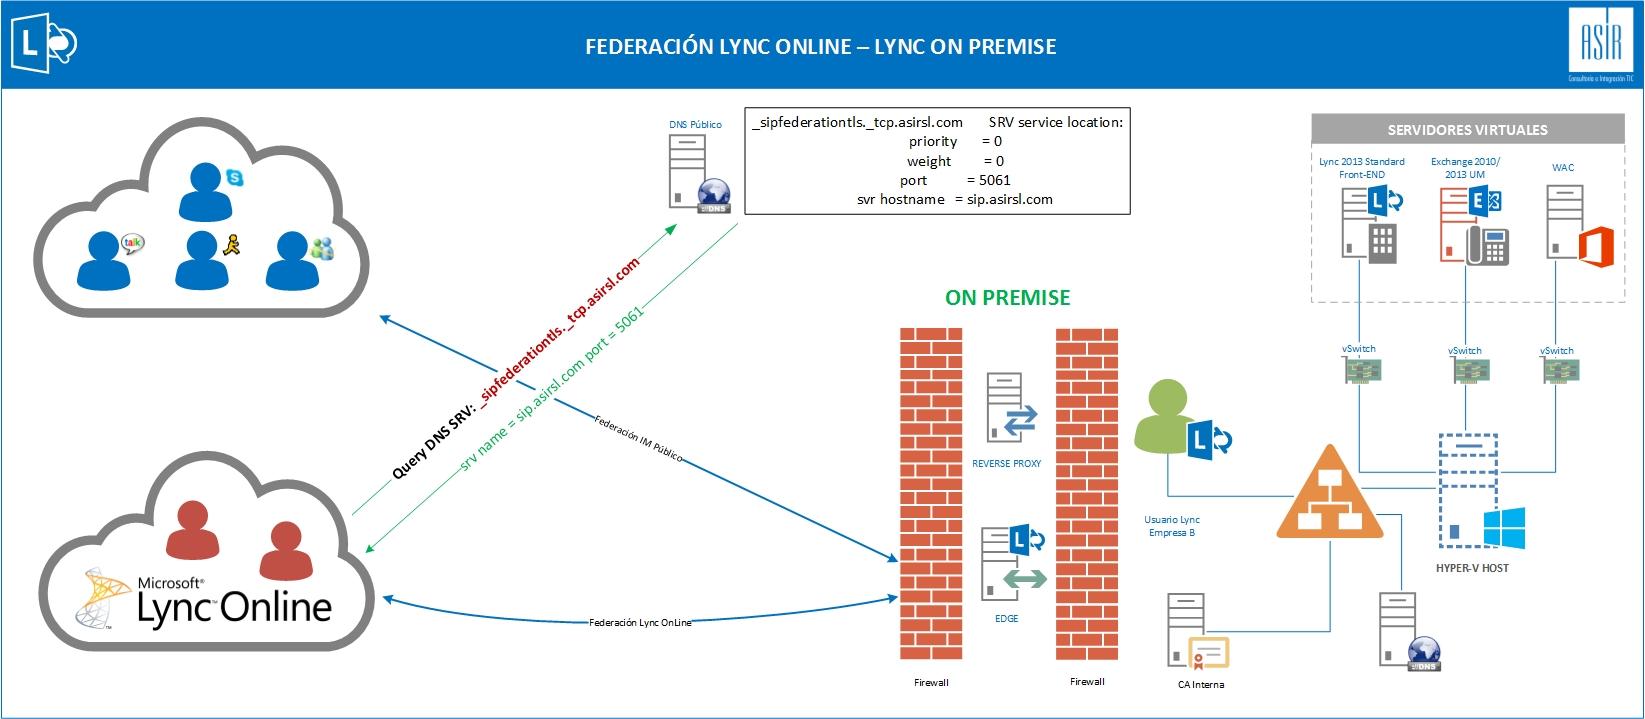 Federaciones_Lync_OP-OL_Esquema.jpg